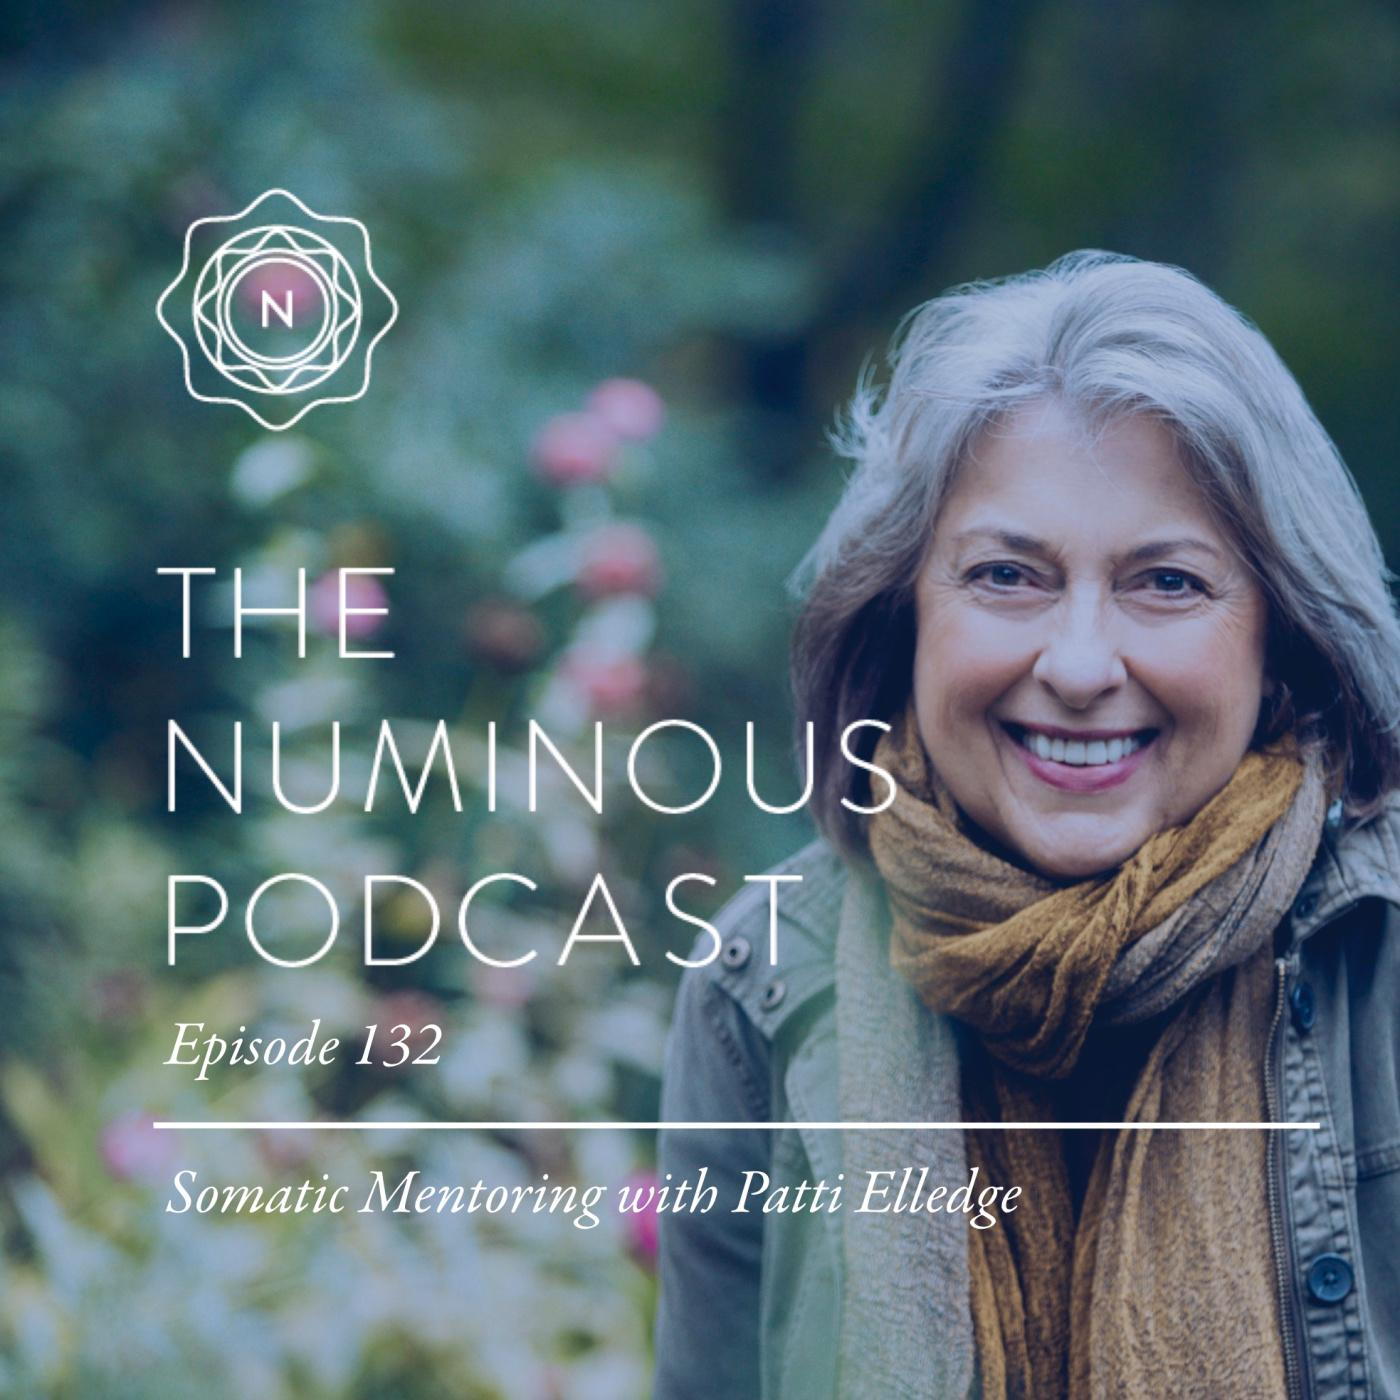 TNP132 Somatic Mentoring with Patti Elledge